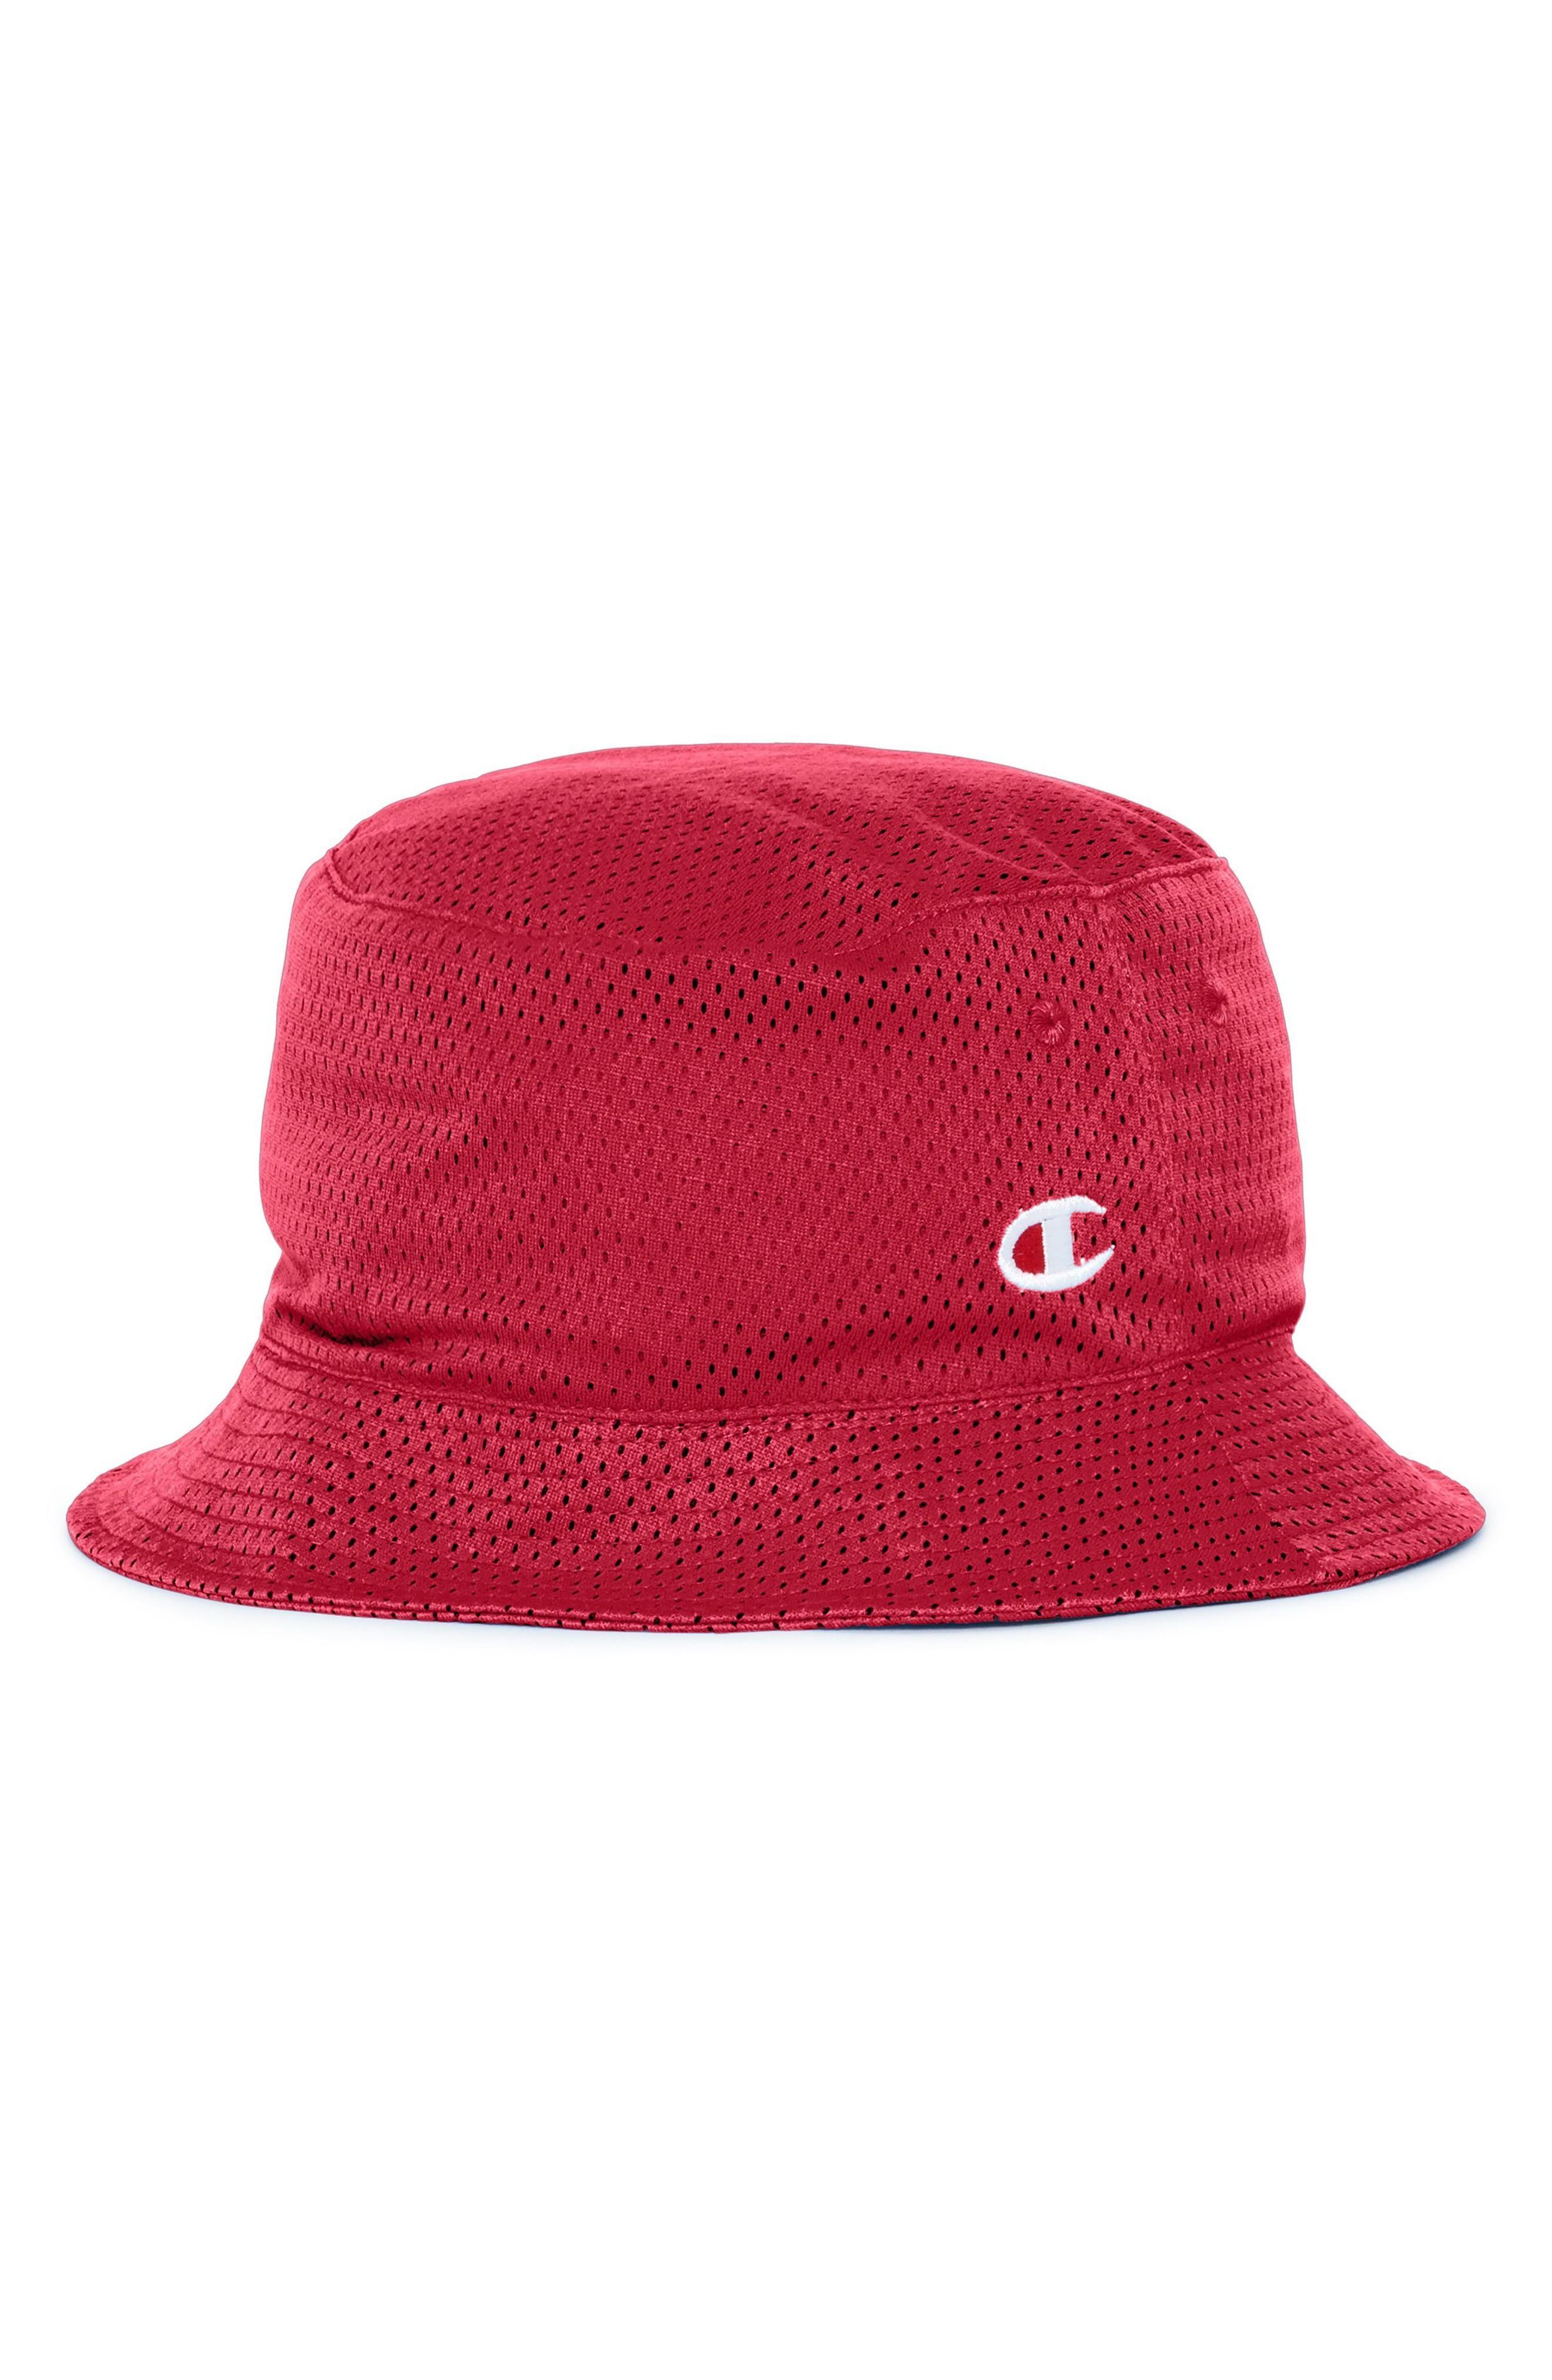 9c80912a Champion Reversible Mesh Bucket Hat In Imperial Indigo/ Scarlet ...